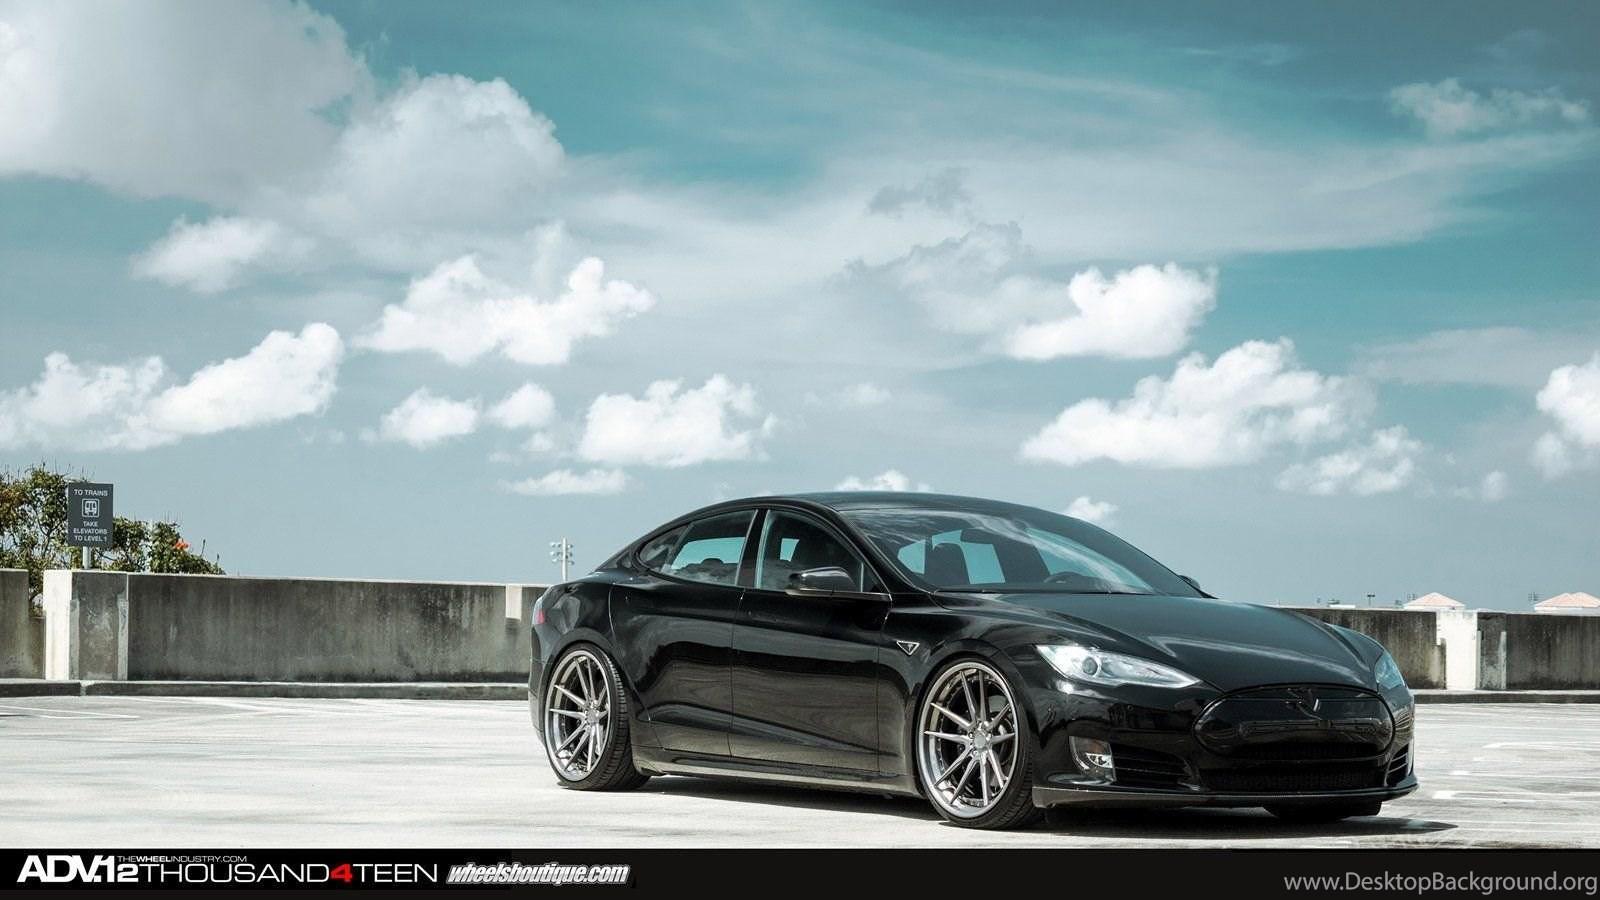 Adv1 Supercar Tuning Whells Tesla Model S Wallpapers Desktop